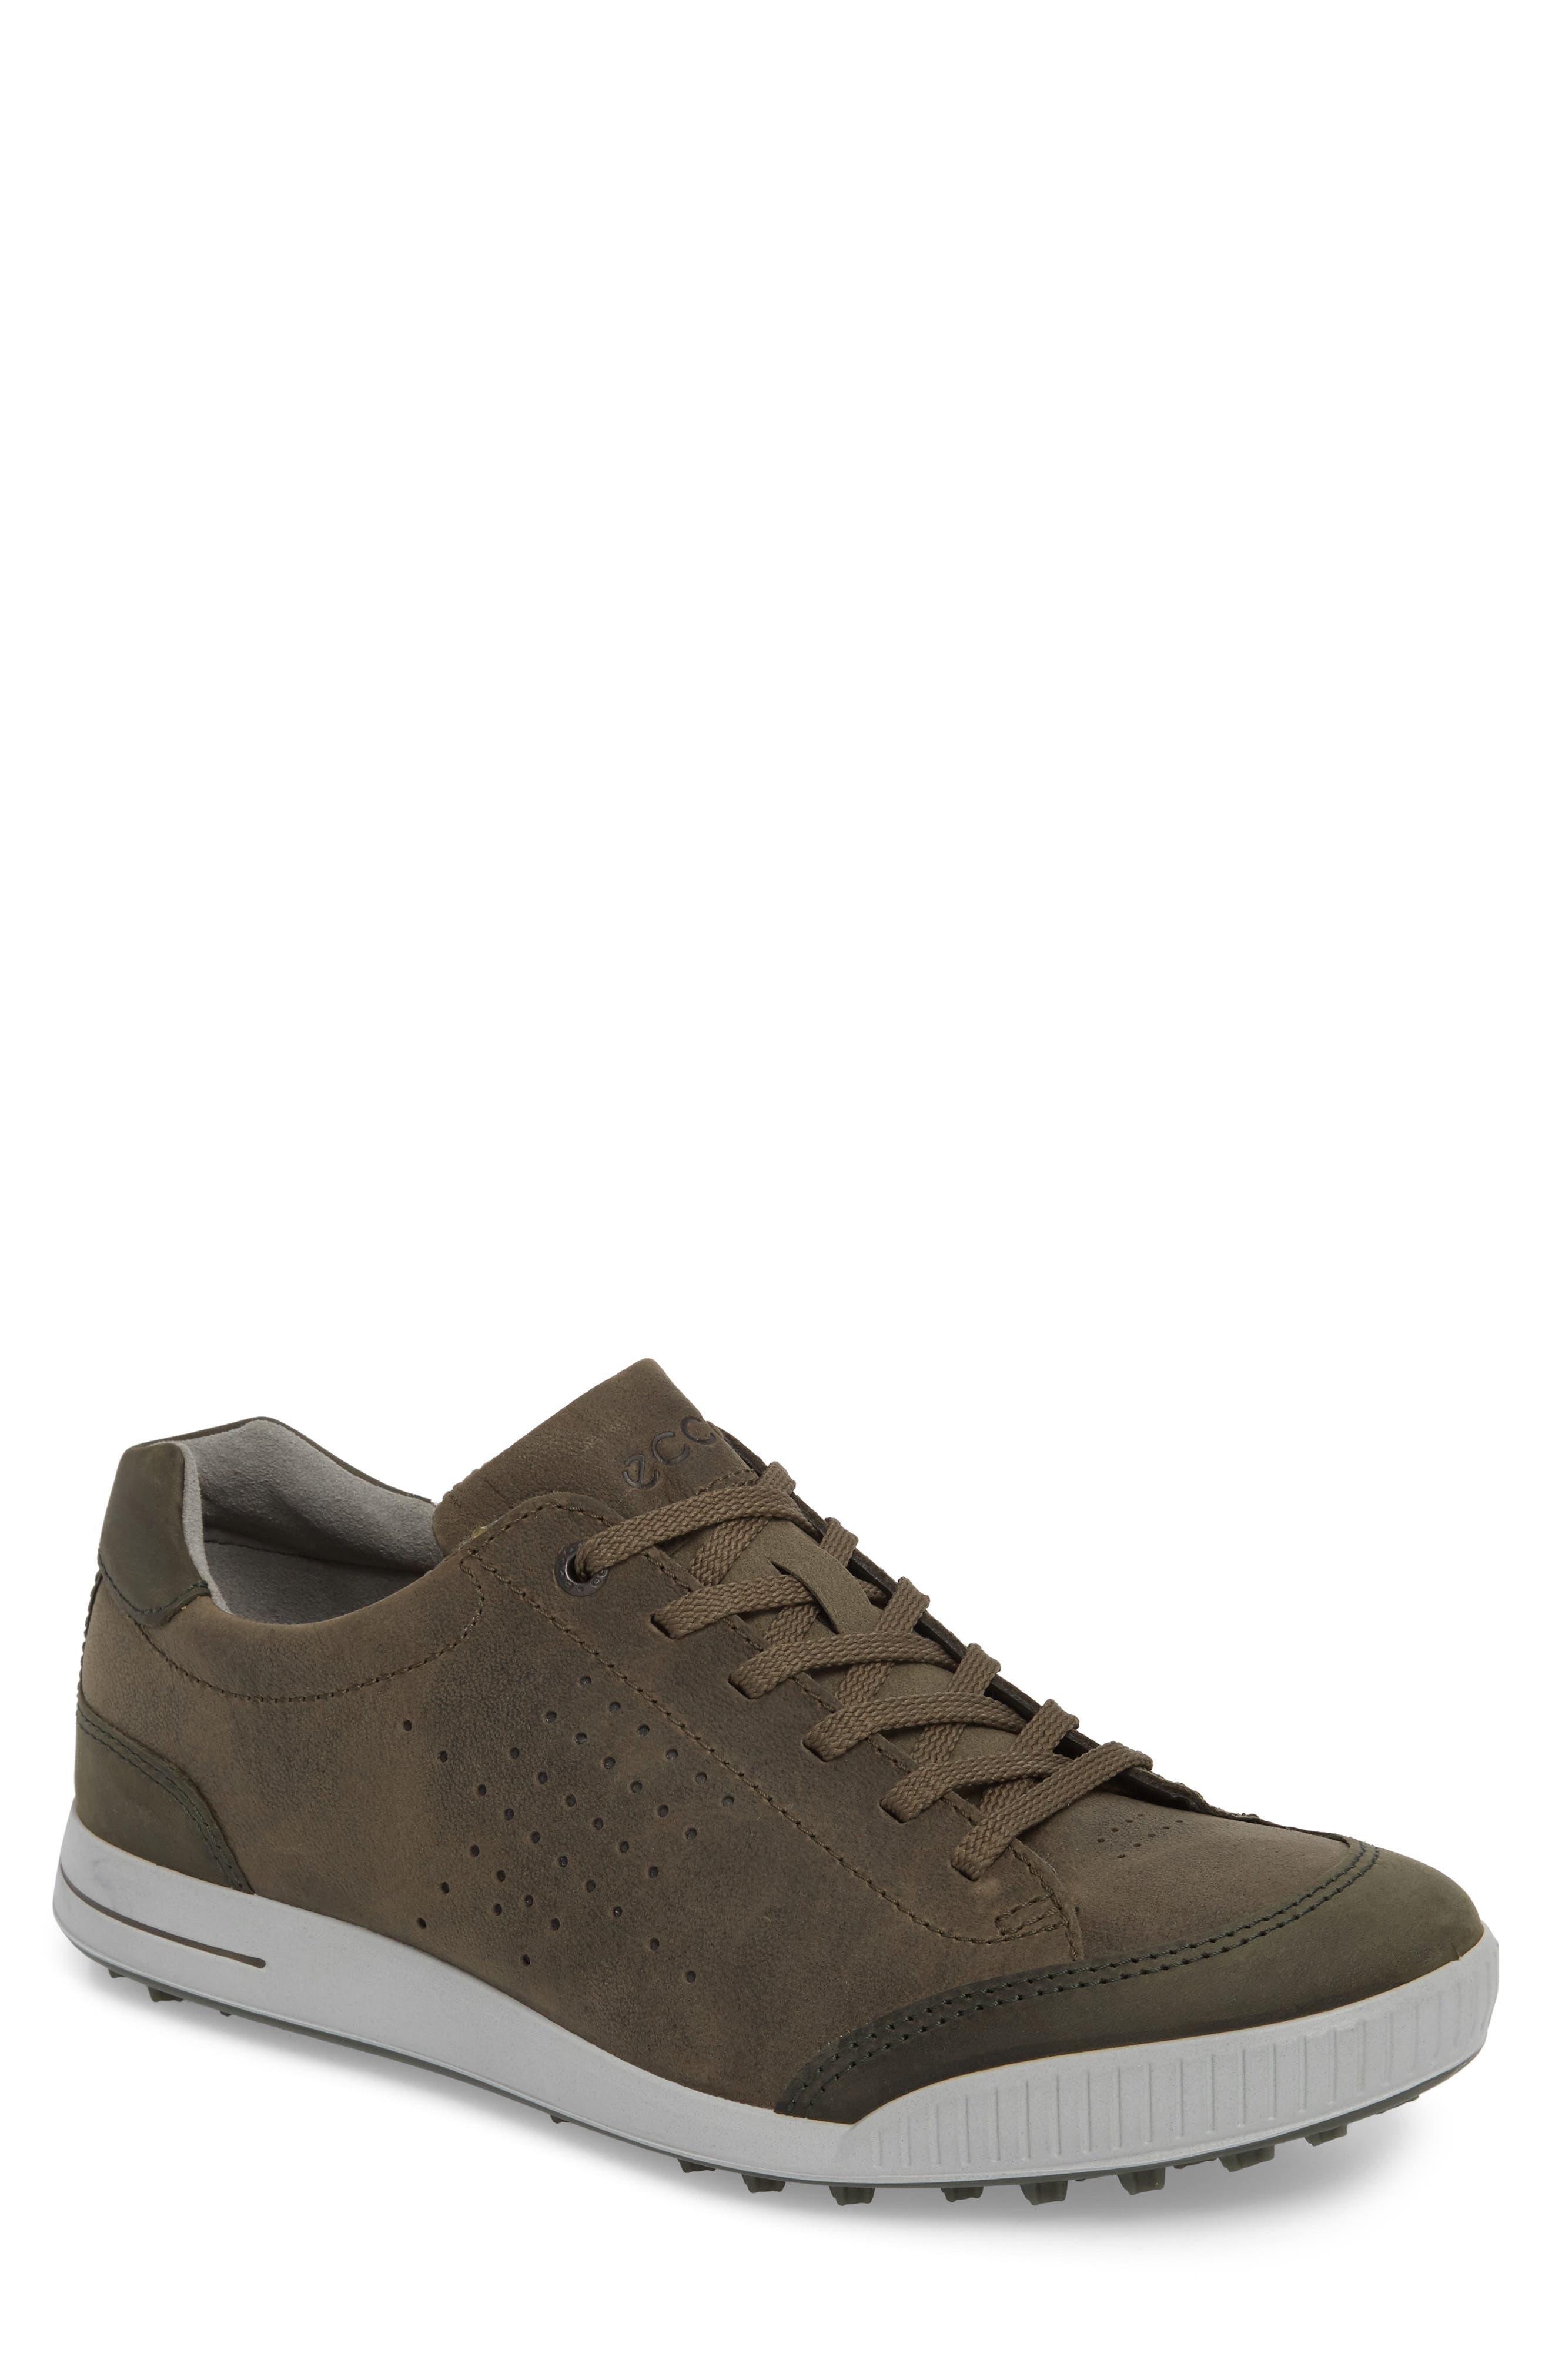 Street Retro HM Golf Shoe,                         Main,                         color, Tarmac/ Deep Fore Leather